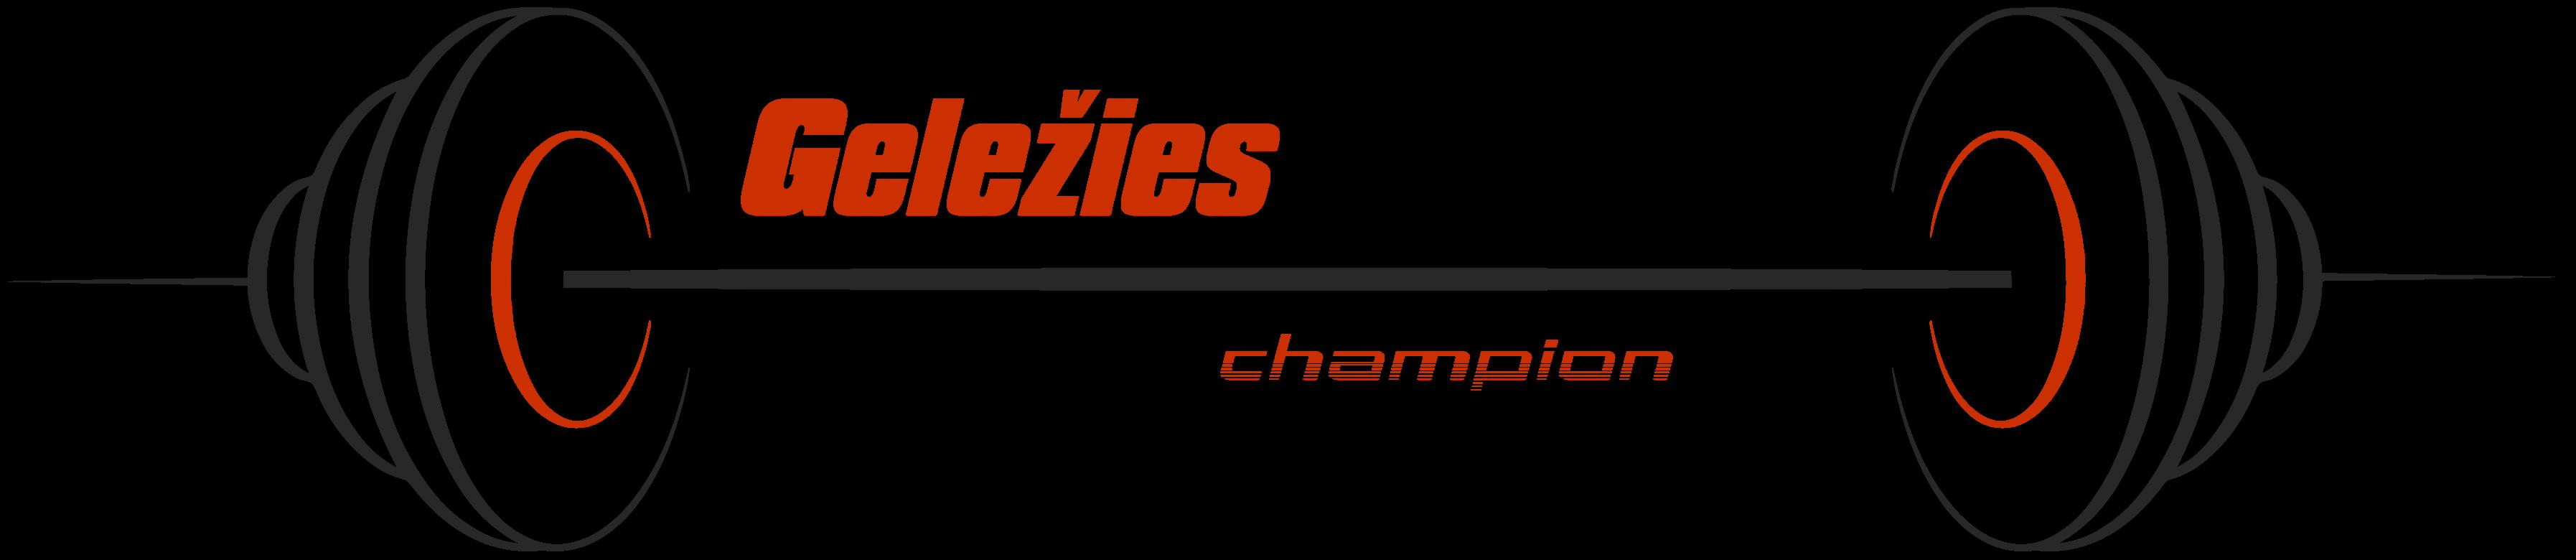 gelezies-logo